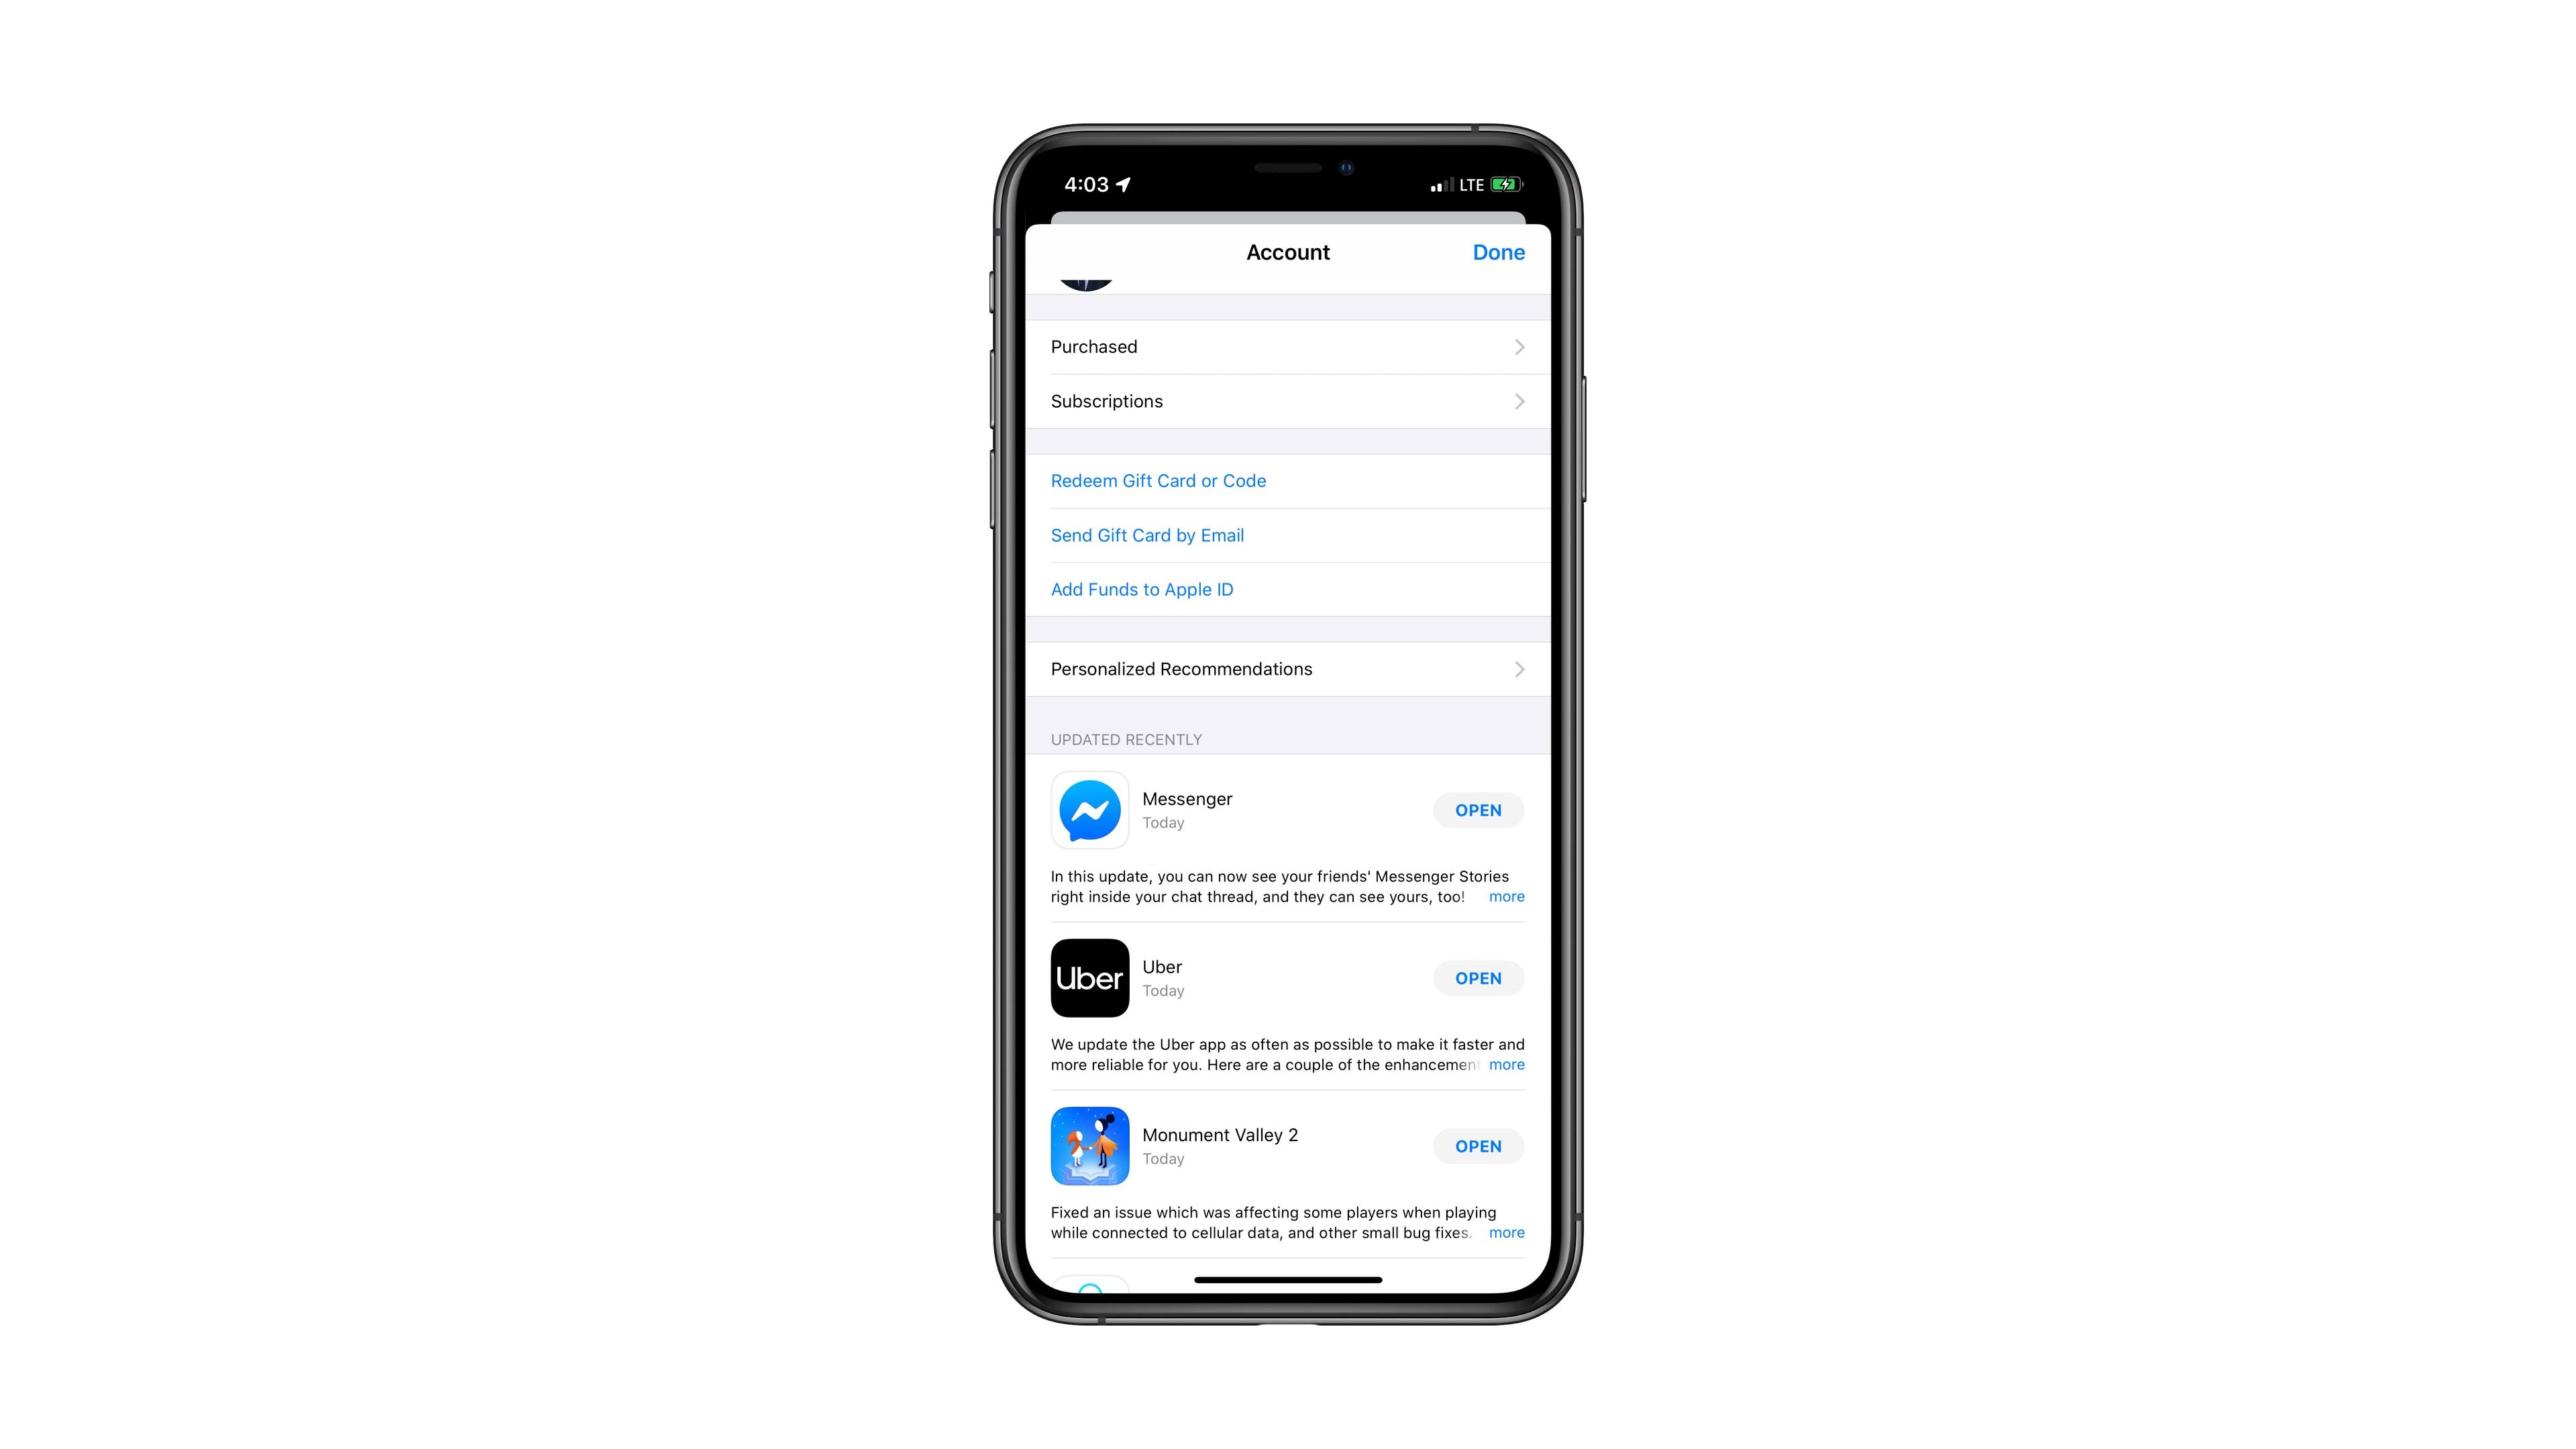 iOS 13 tidbits: Battery, Maps improvements, more - 9to5Mac